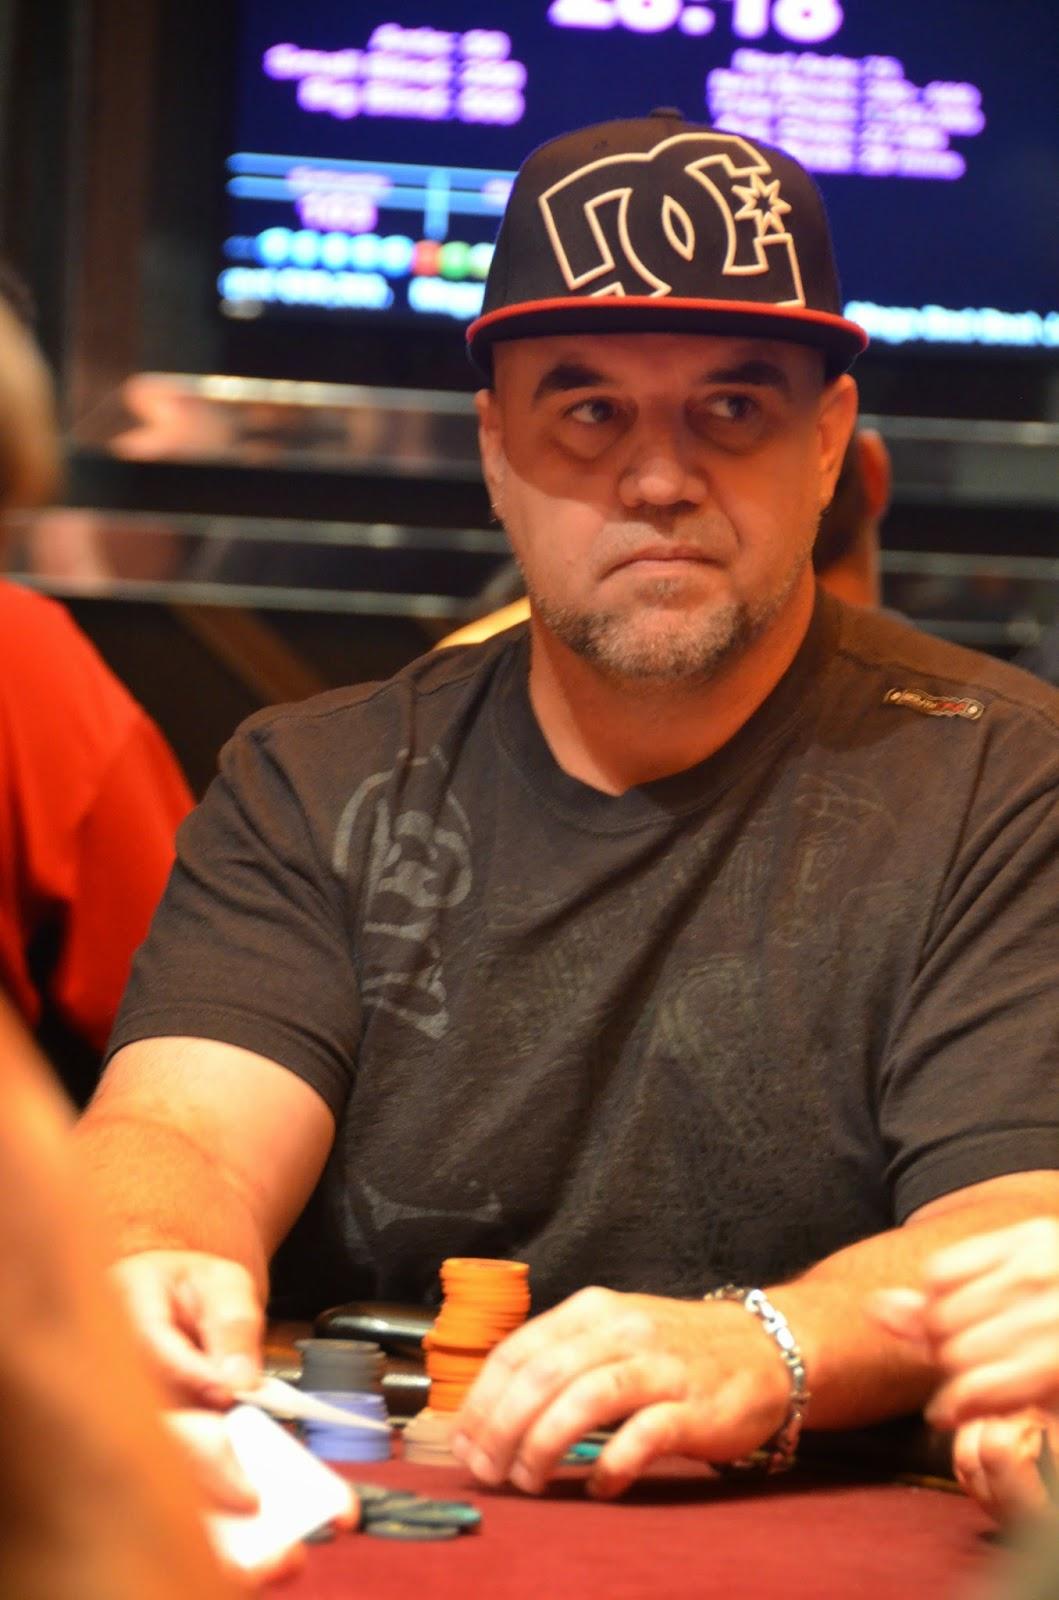 James sloat poker pokerstars casino games not working